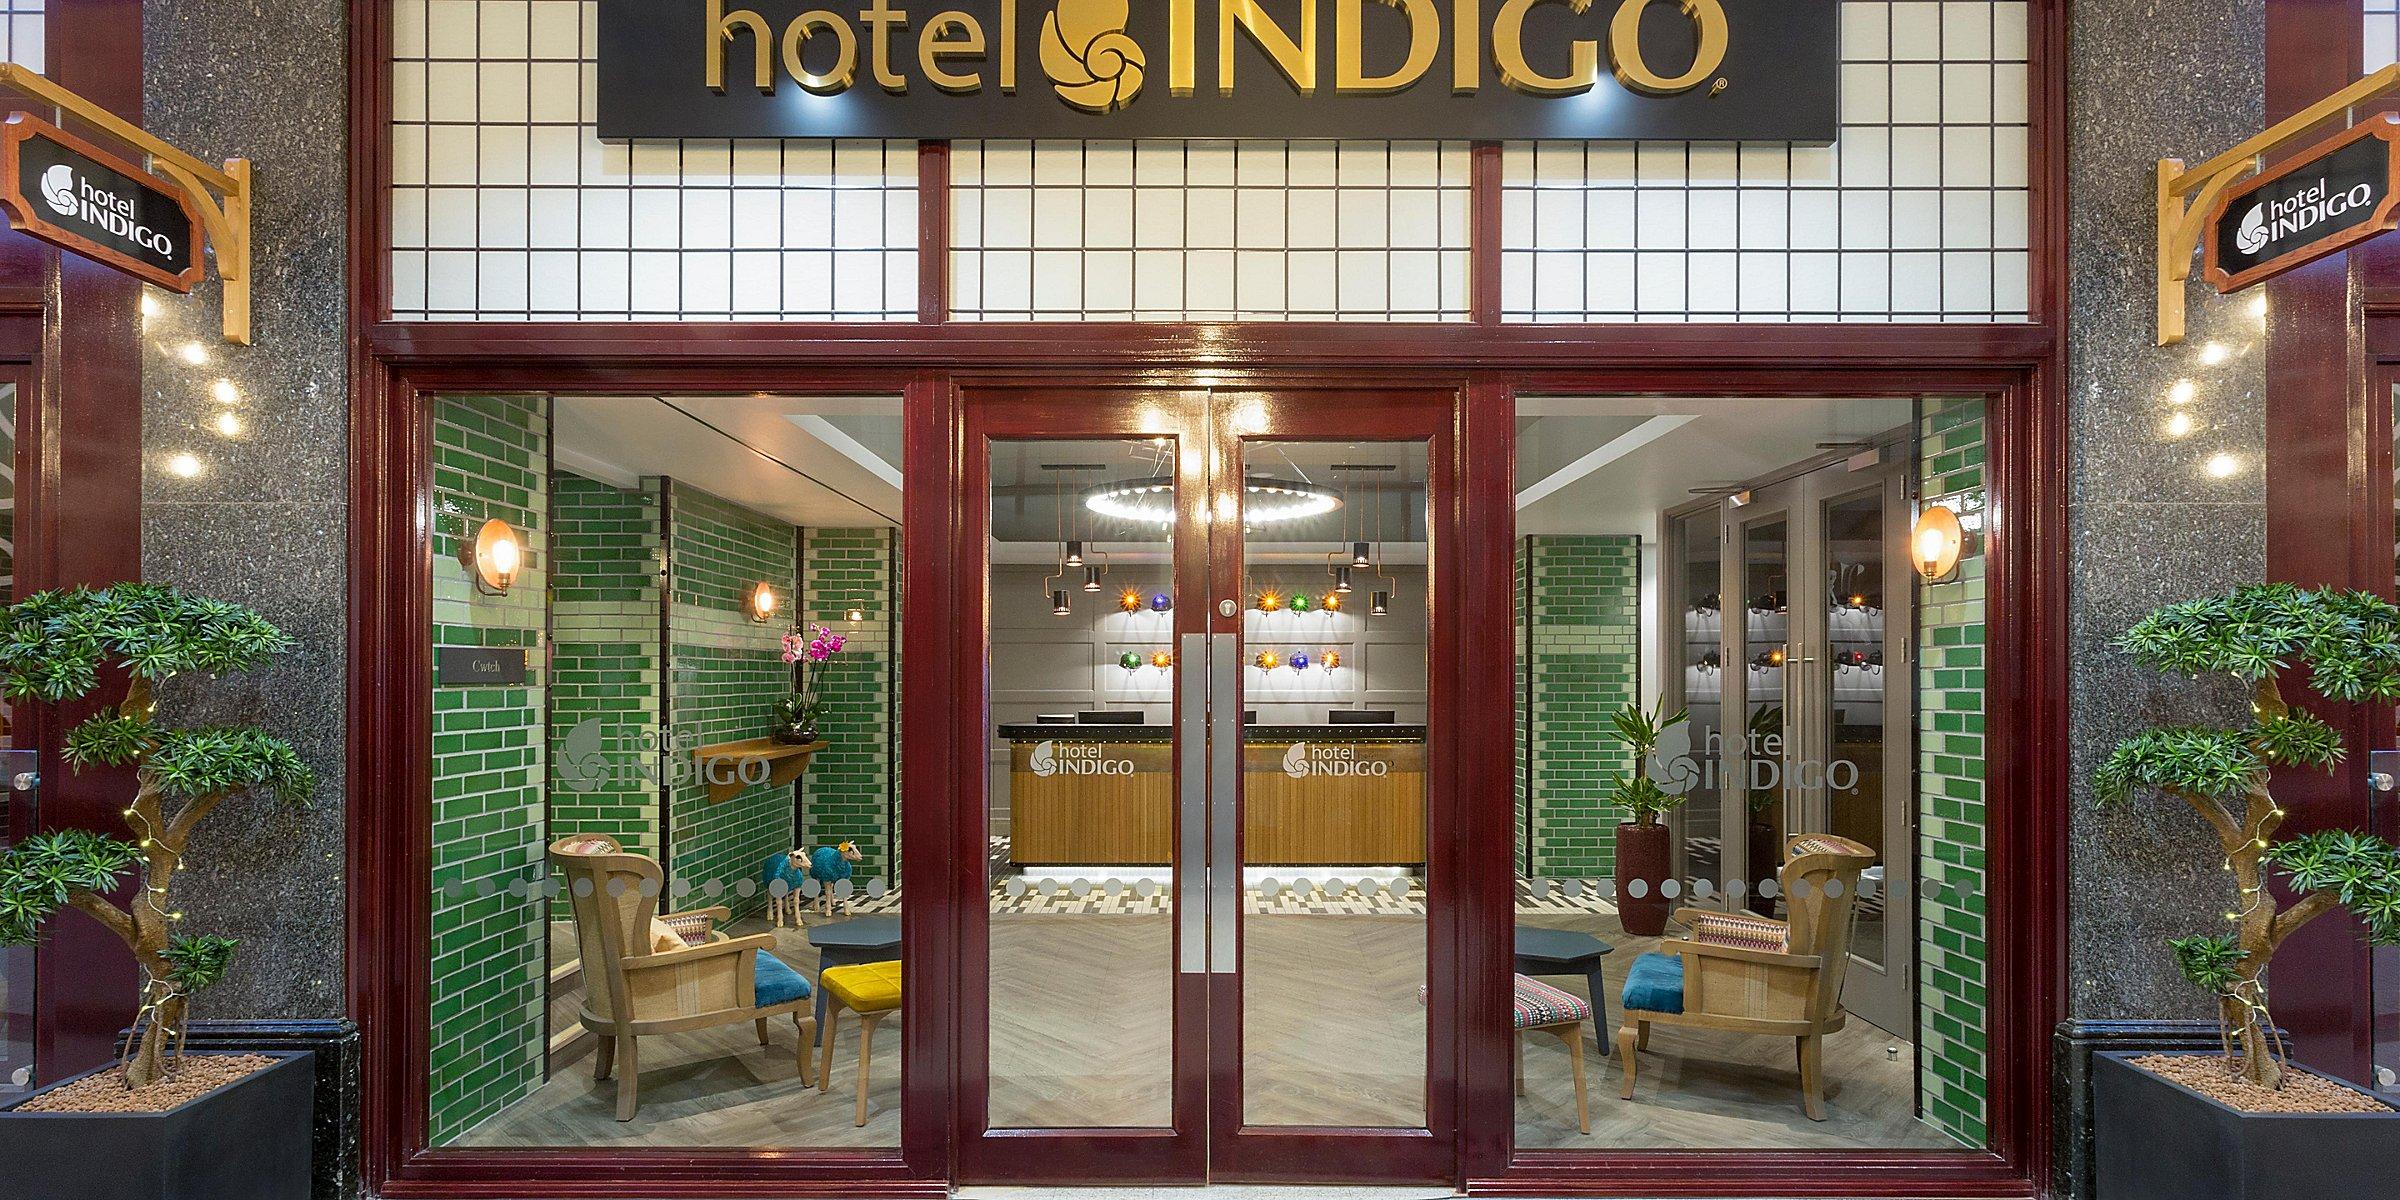 Hotel Indigo Cardiff Wales Boutique Cardiff City Centre Hotel